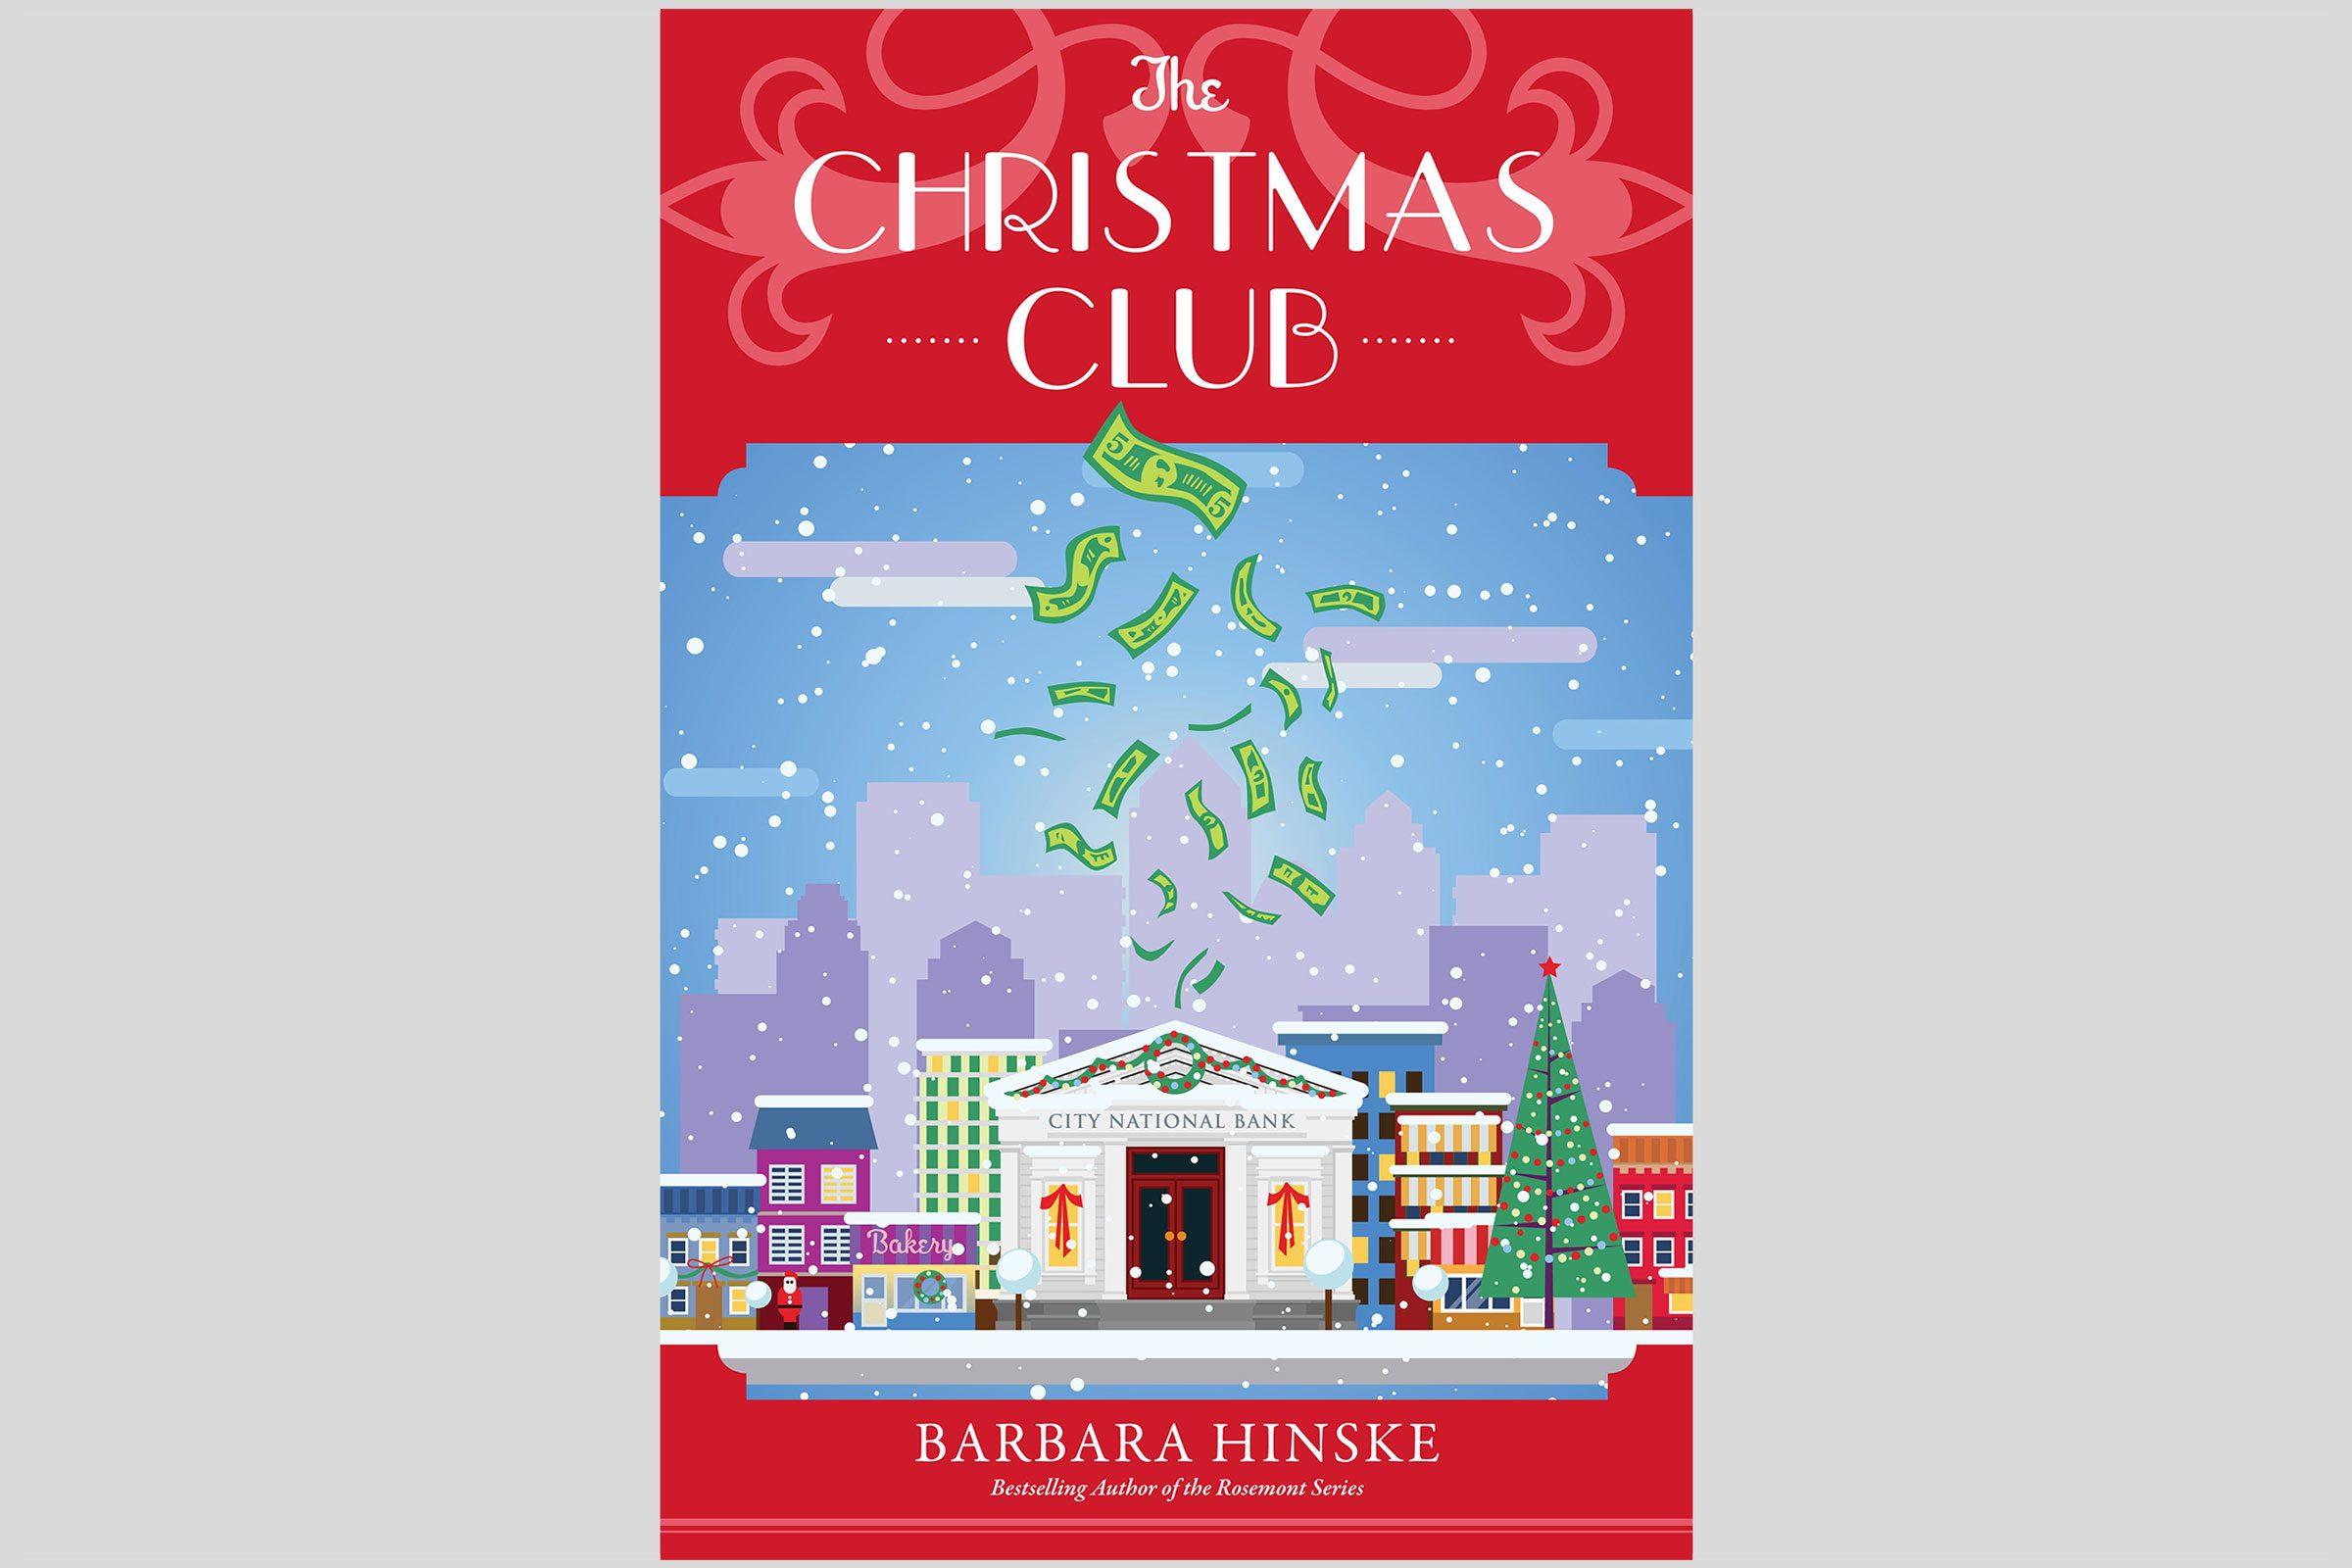 the christmas club book cover by barbara hinske